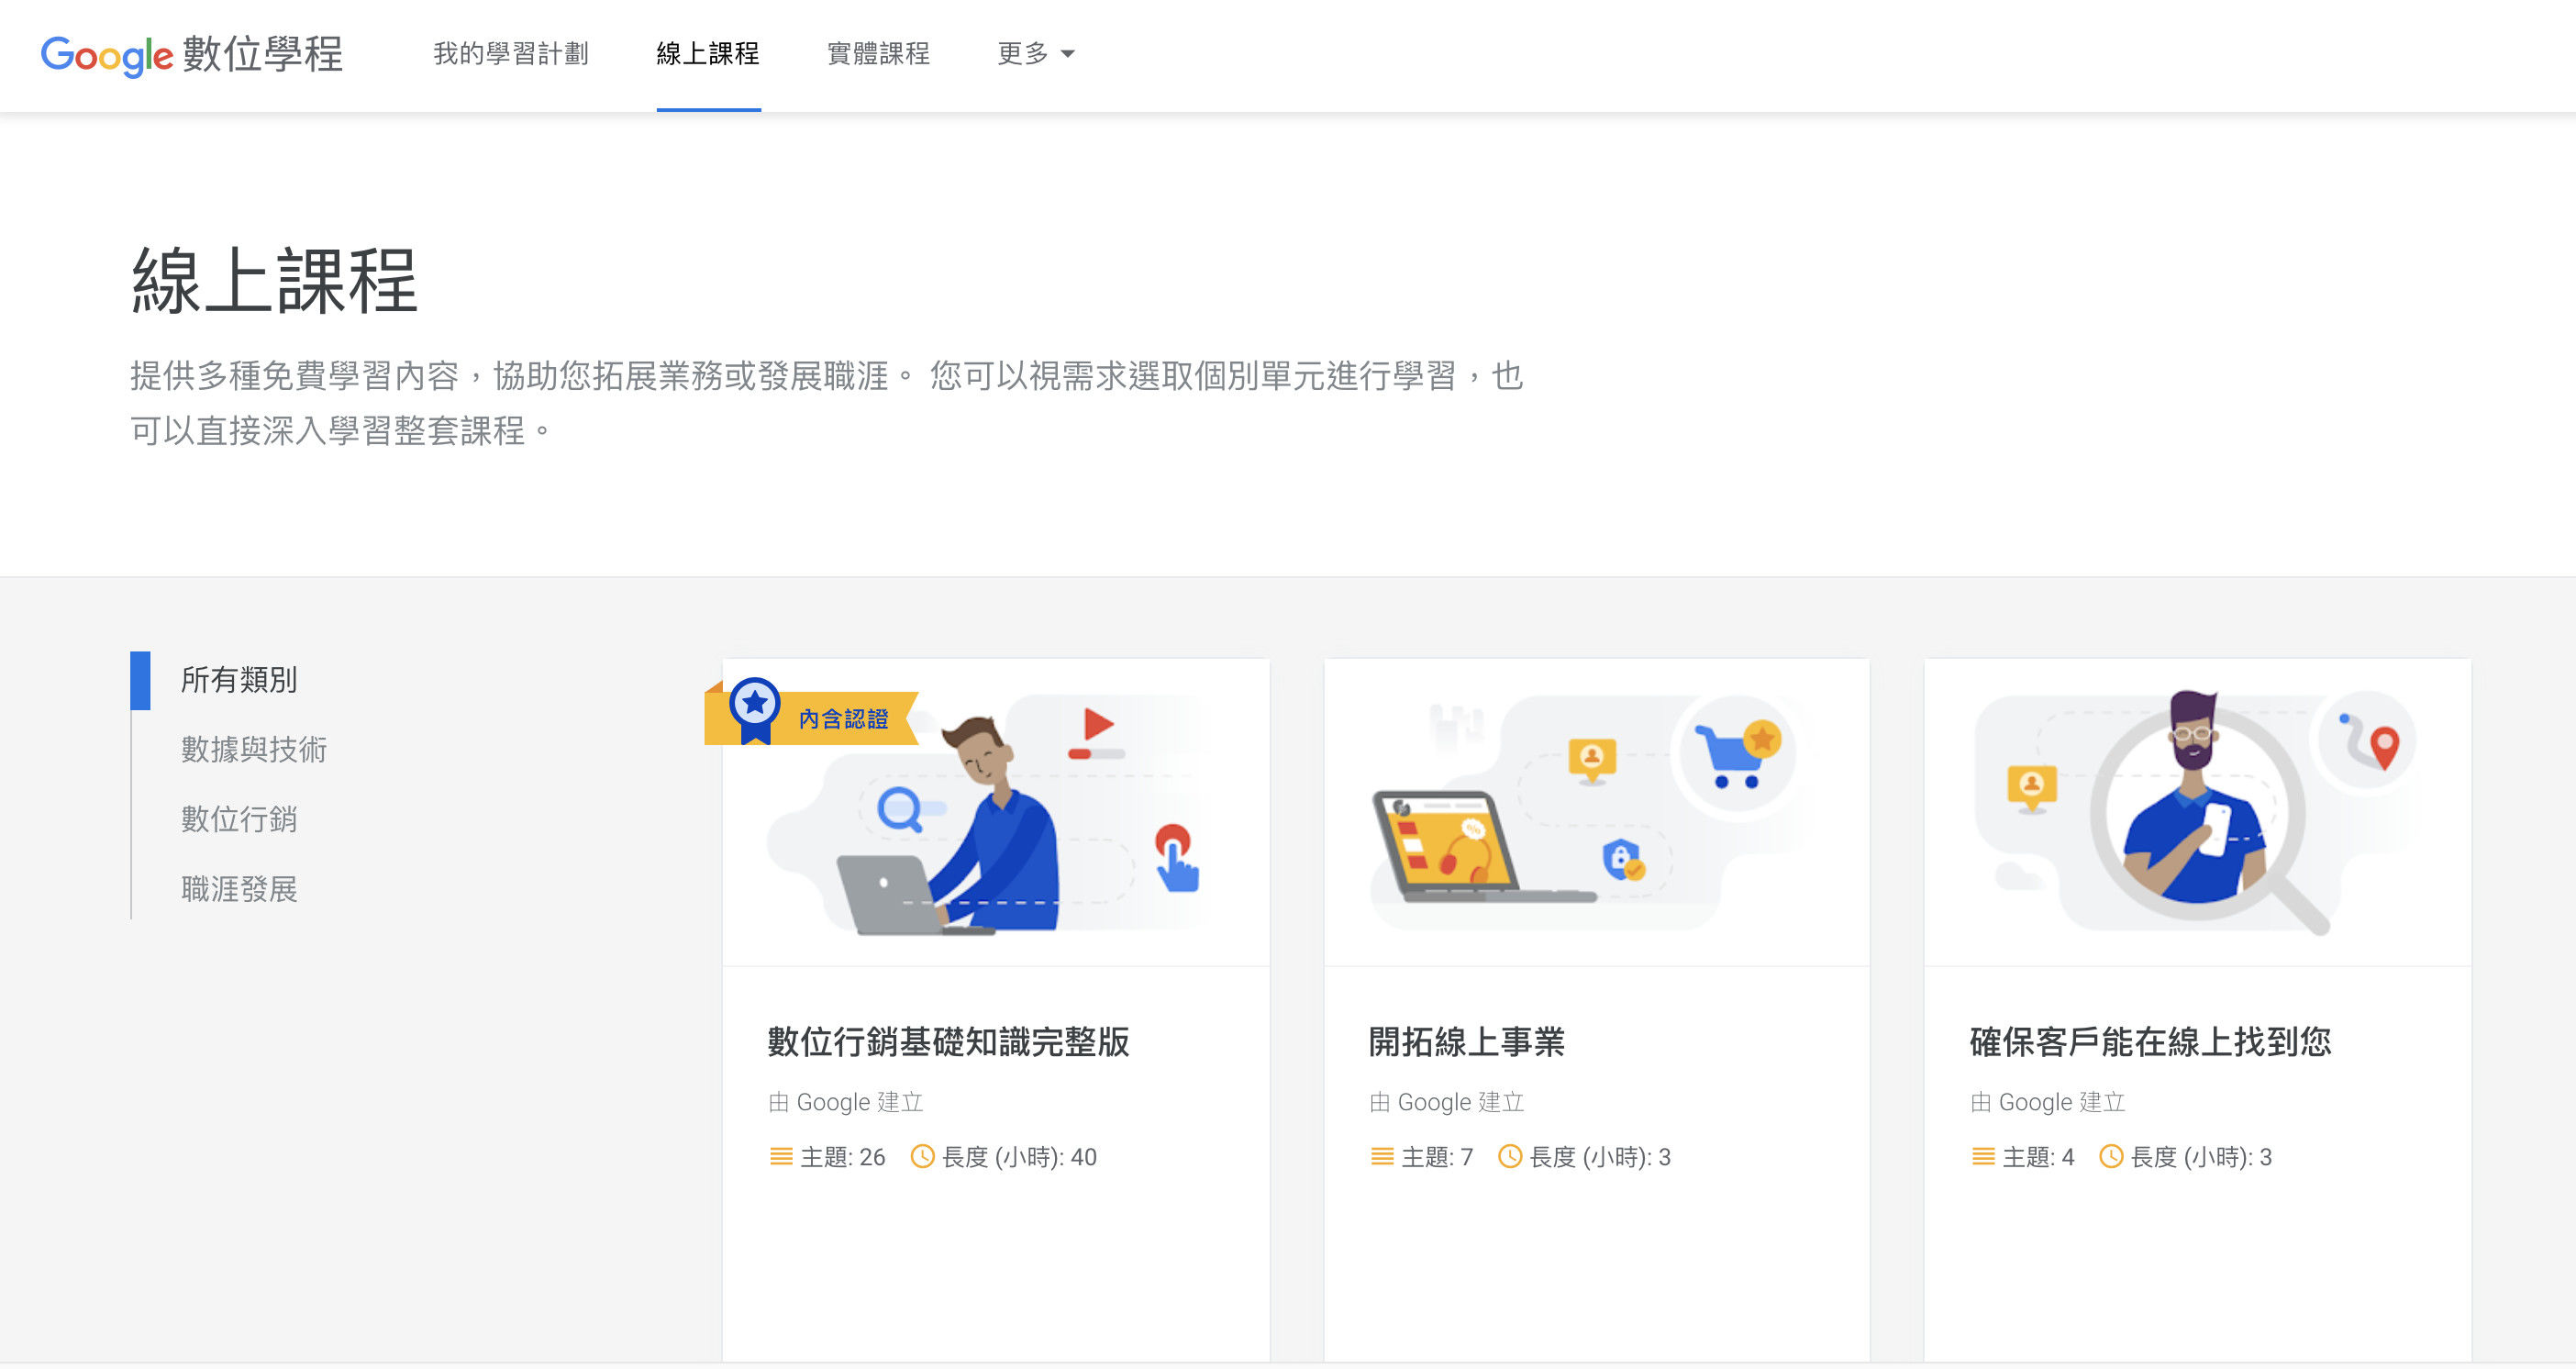 Google數位學程認證智慧台灣計畫線上課程-鯊客科技SEO網頁設計公司